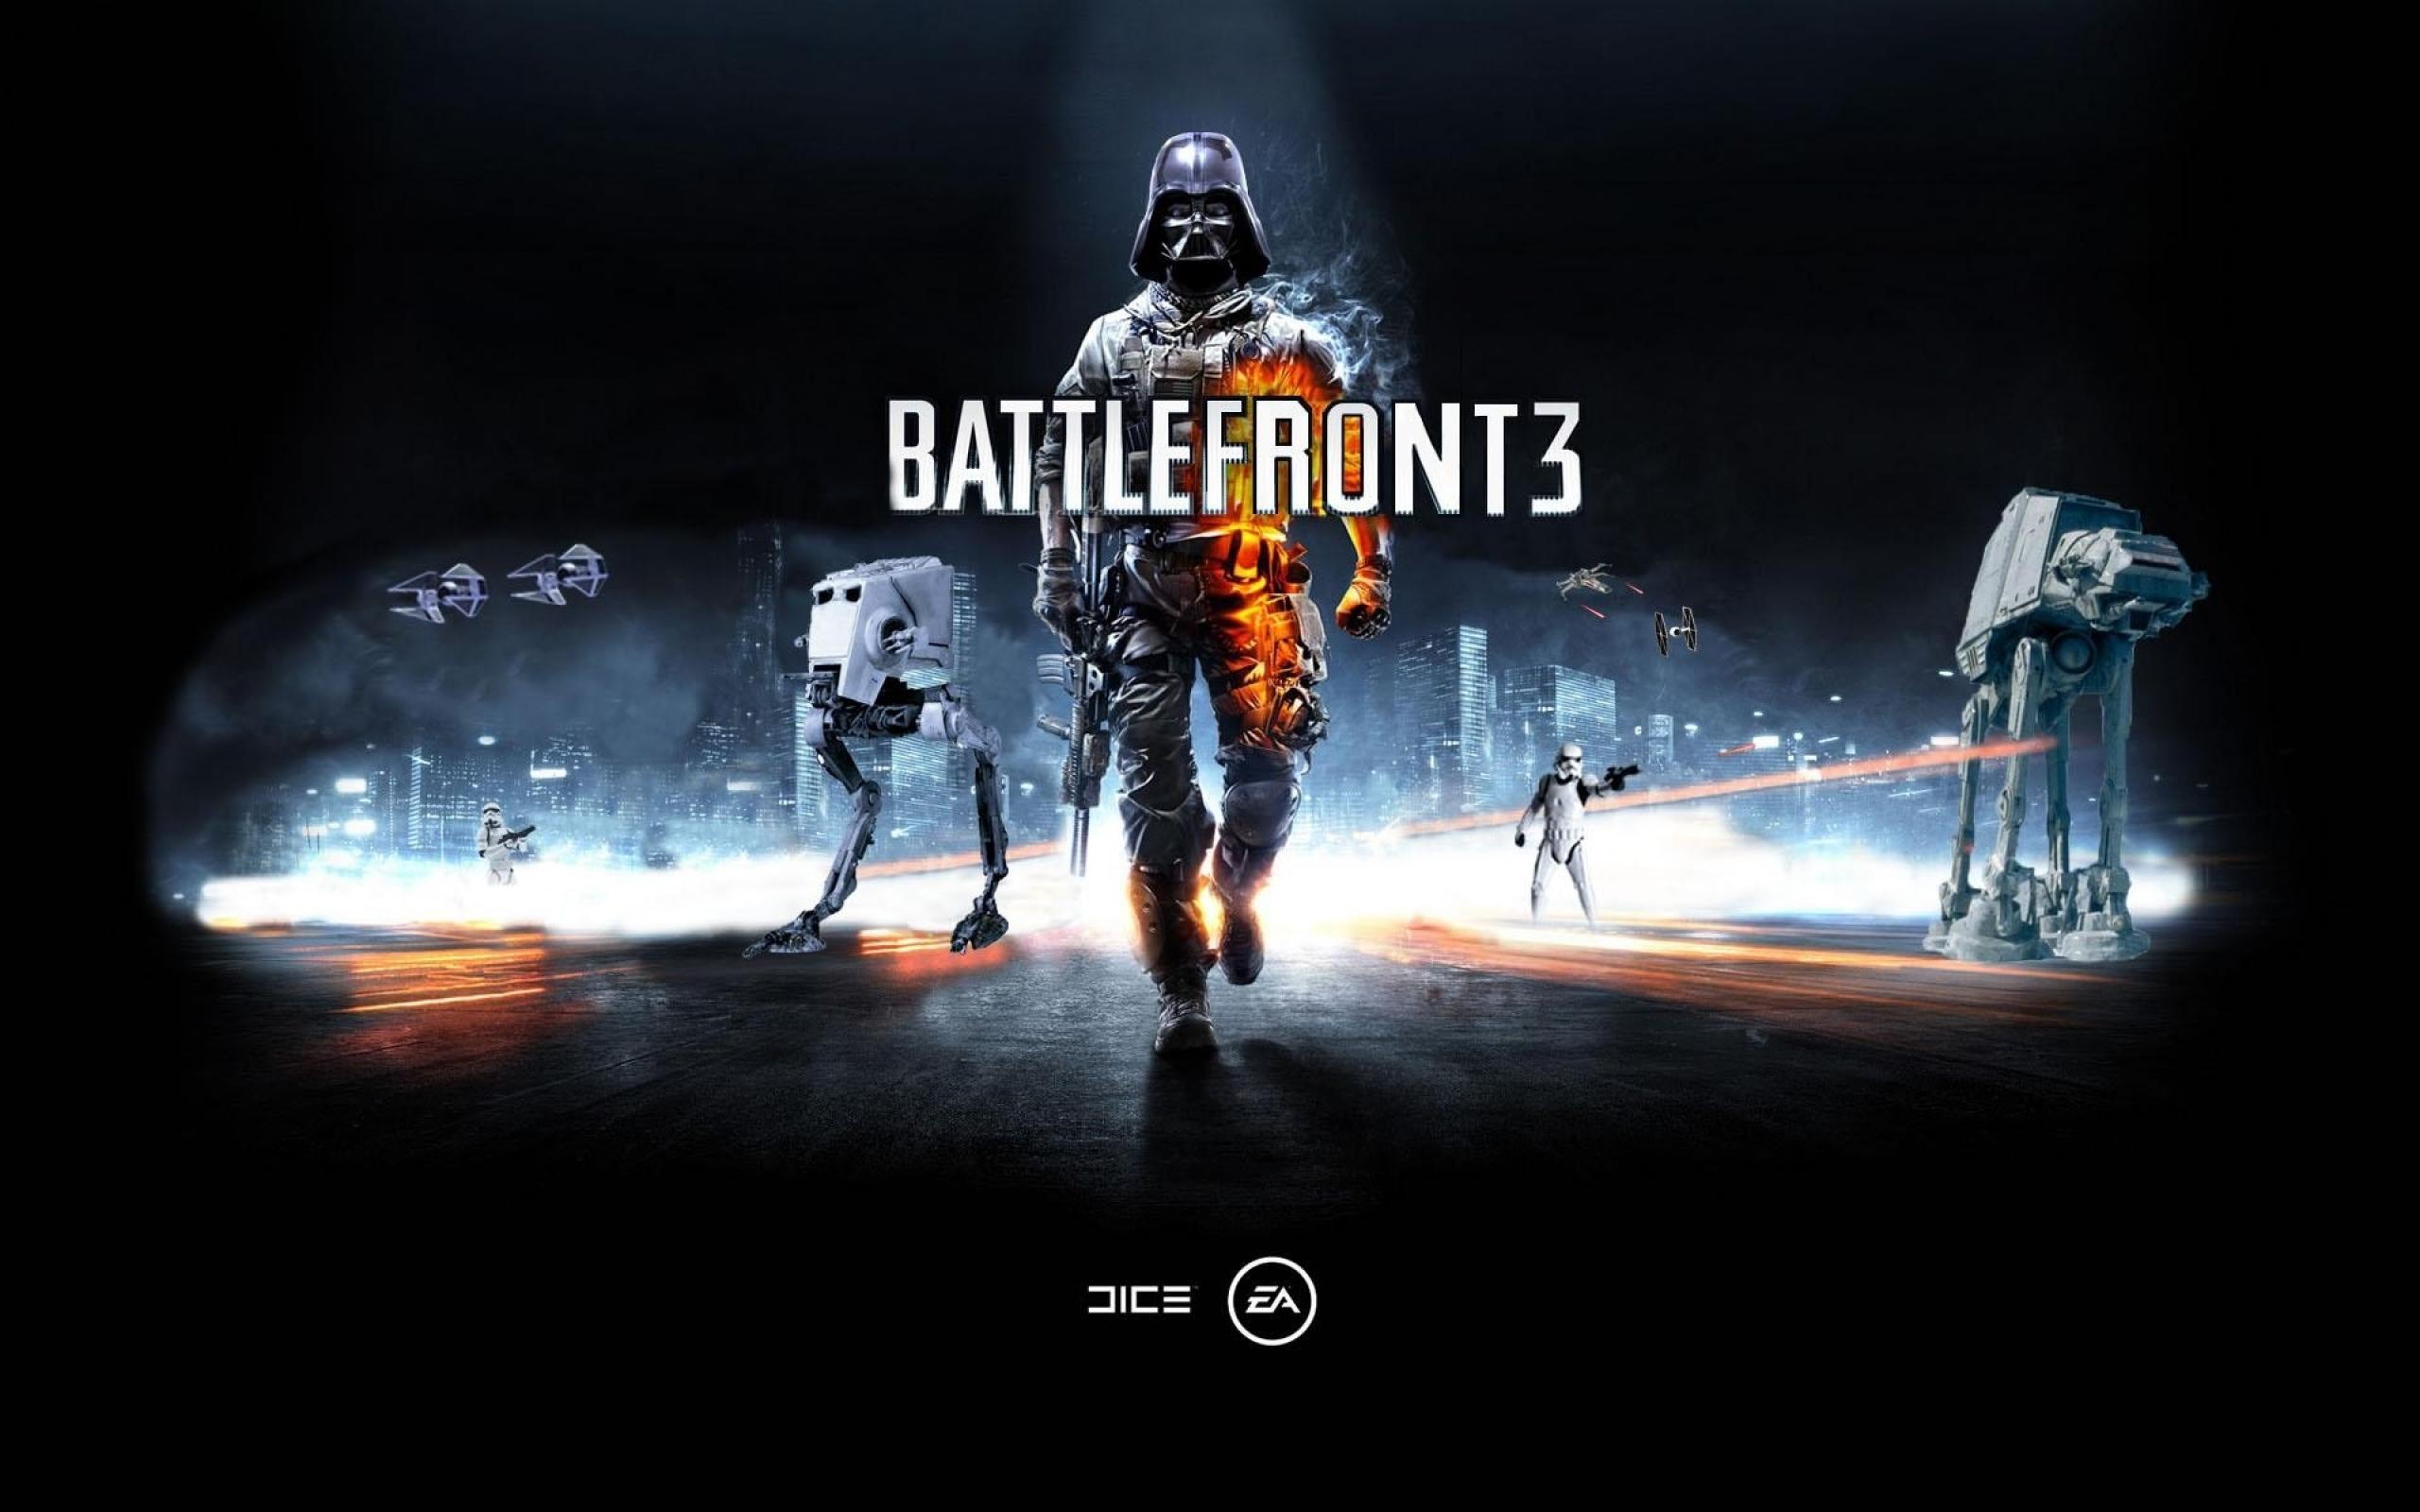 Star Wars Battlefront/Battlefield 3 The Galactic Empire